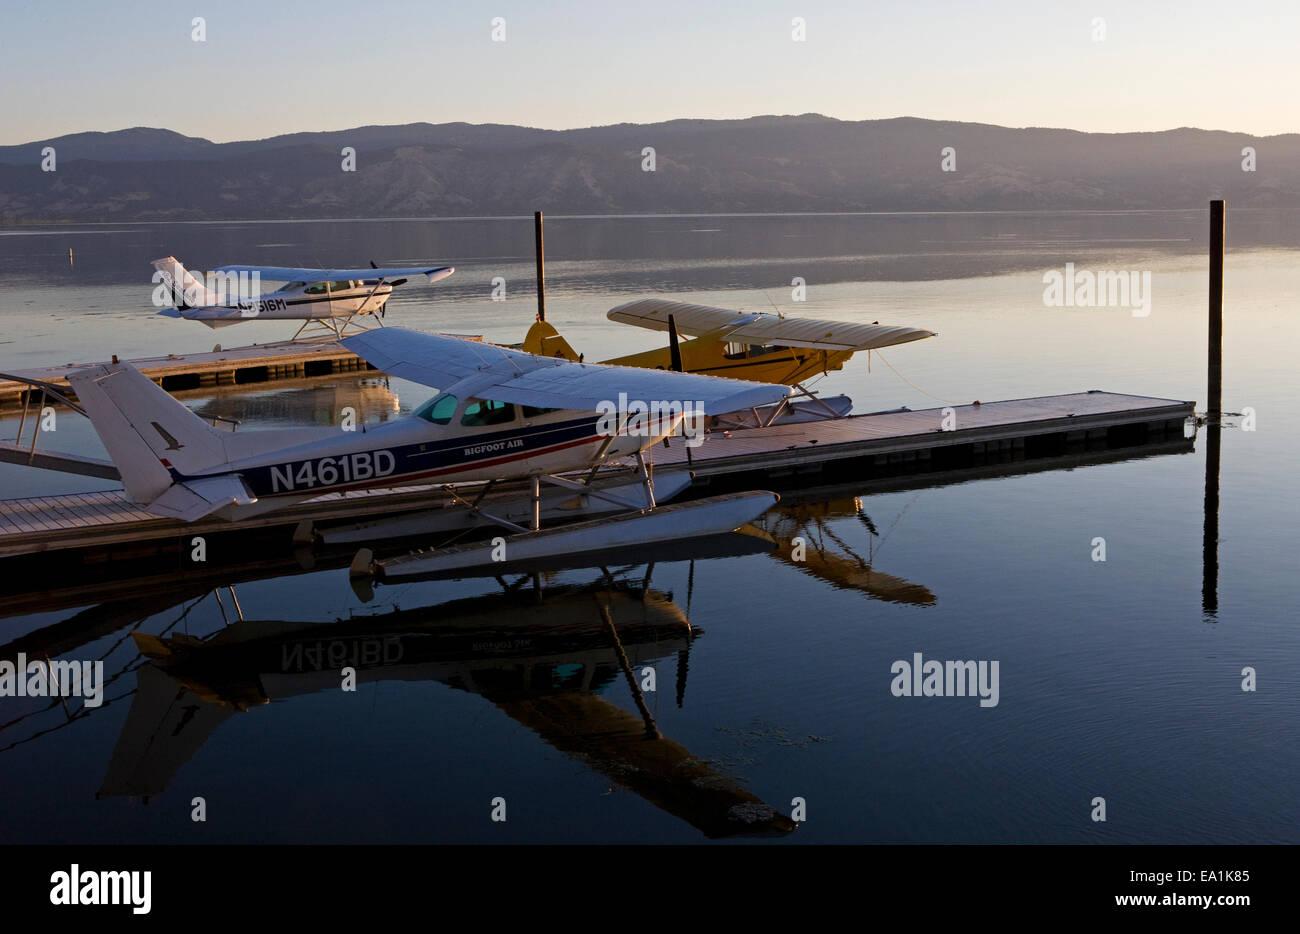 Seaplanes Docked at the Sky Lark Resort at the Splash-In, Lakeport, California, Lake County, California - Stock Image